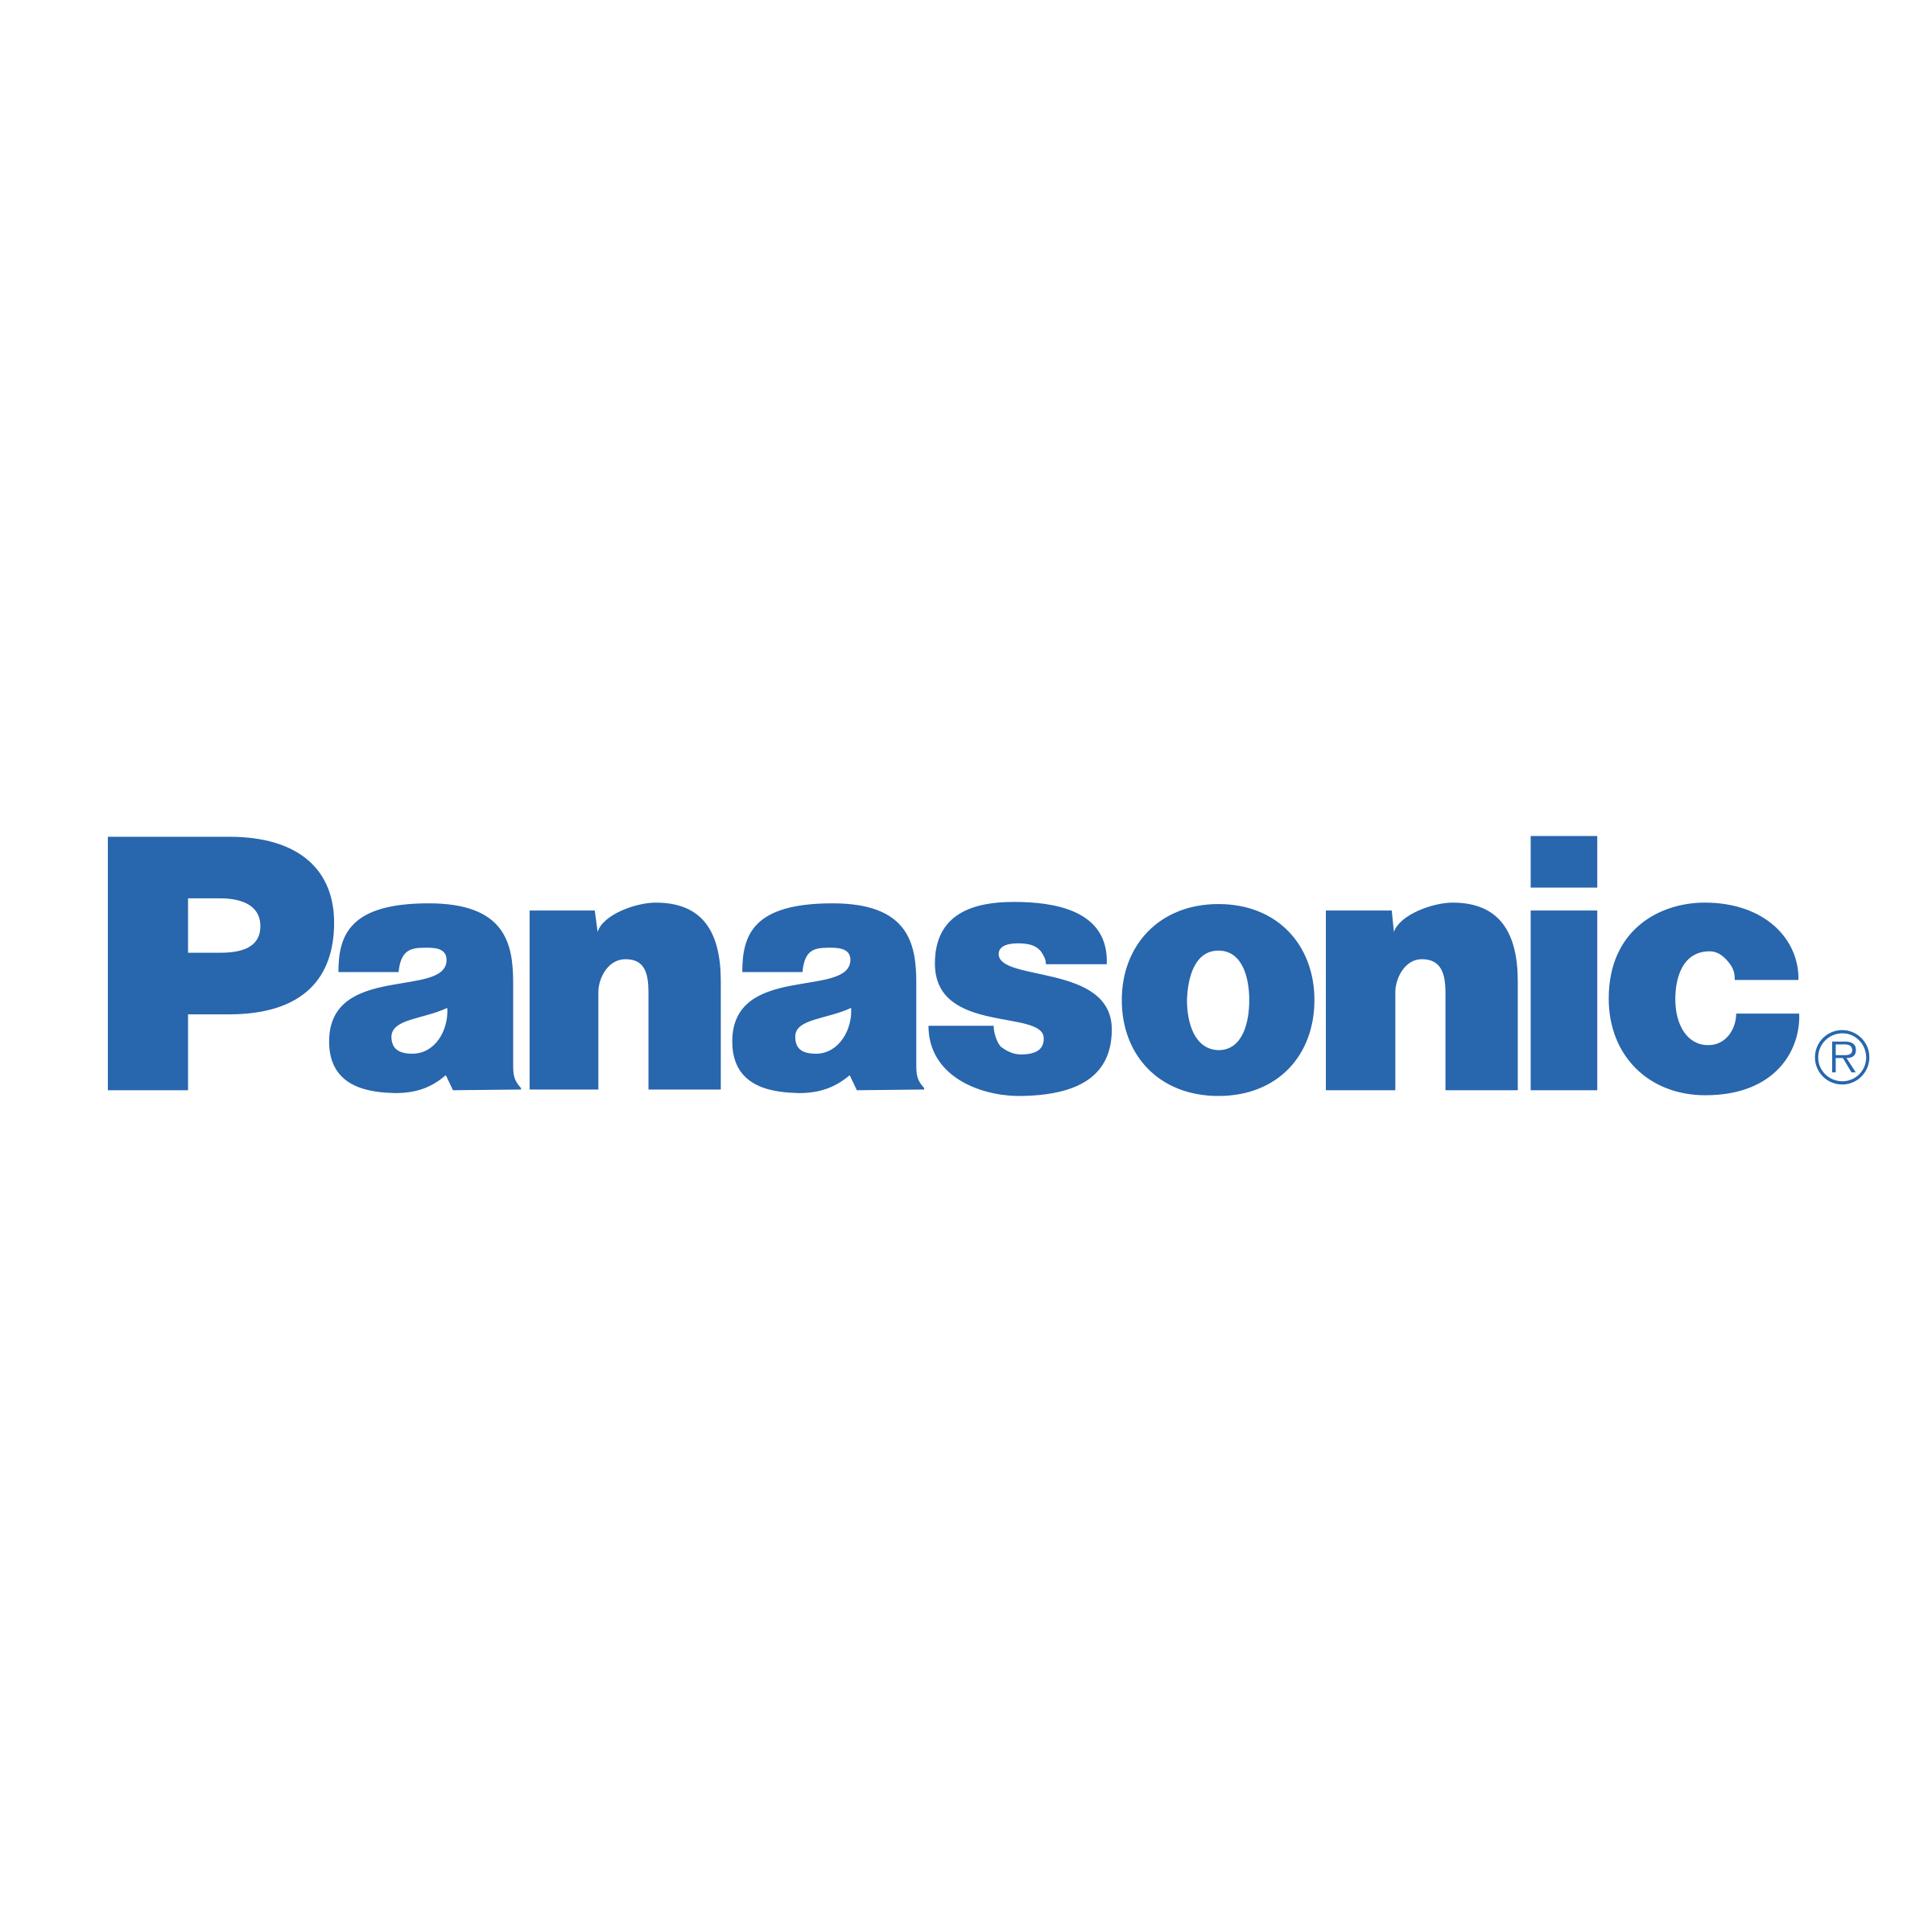 Panasonic Logo Png (+).